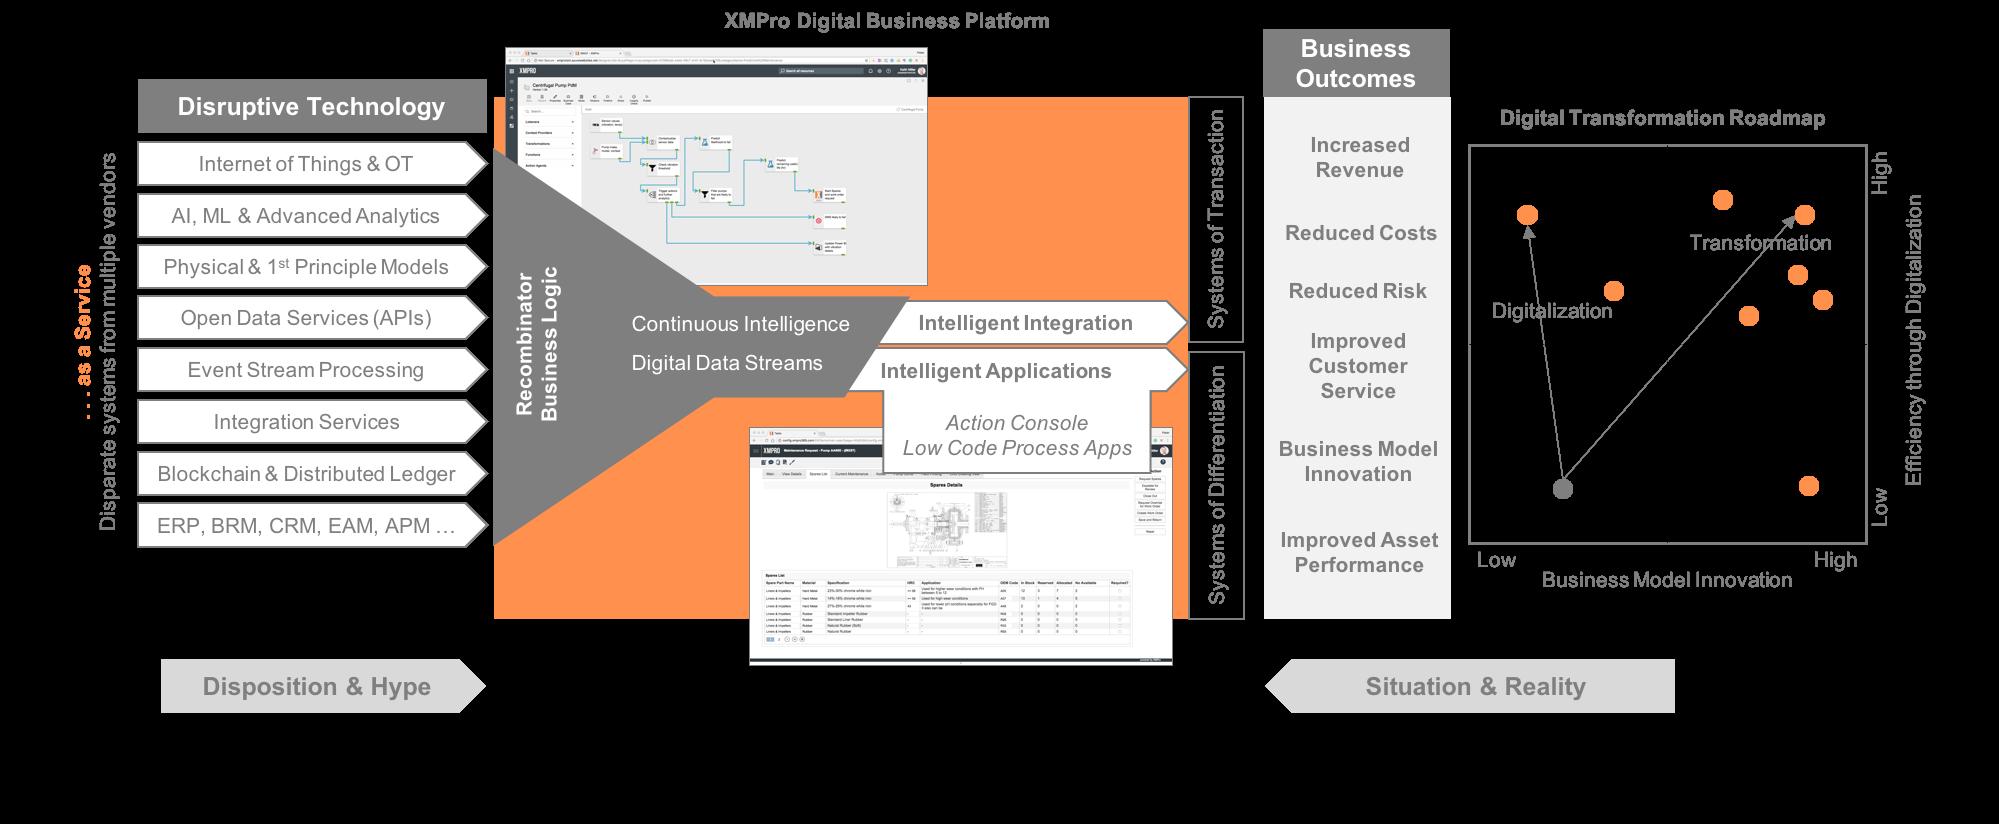 XMPro Digital Business Platform Diagram